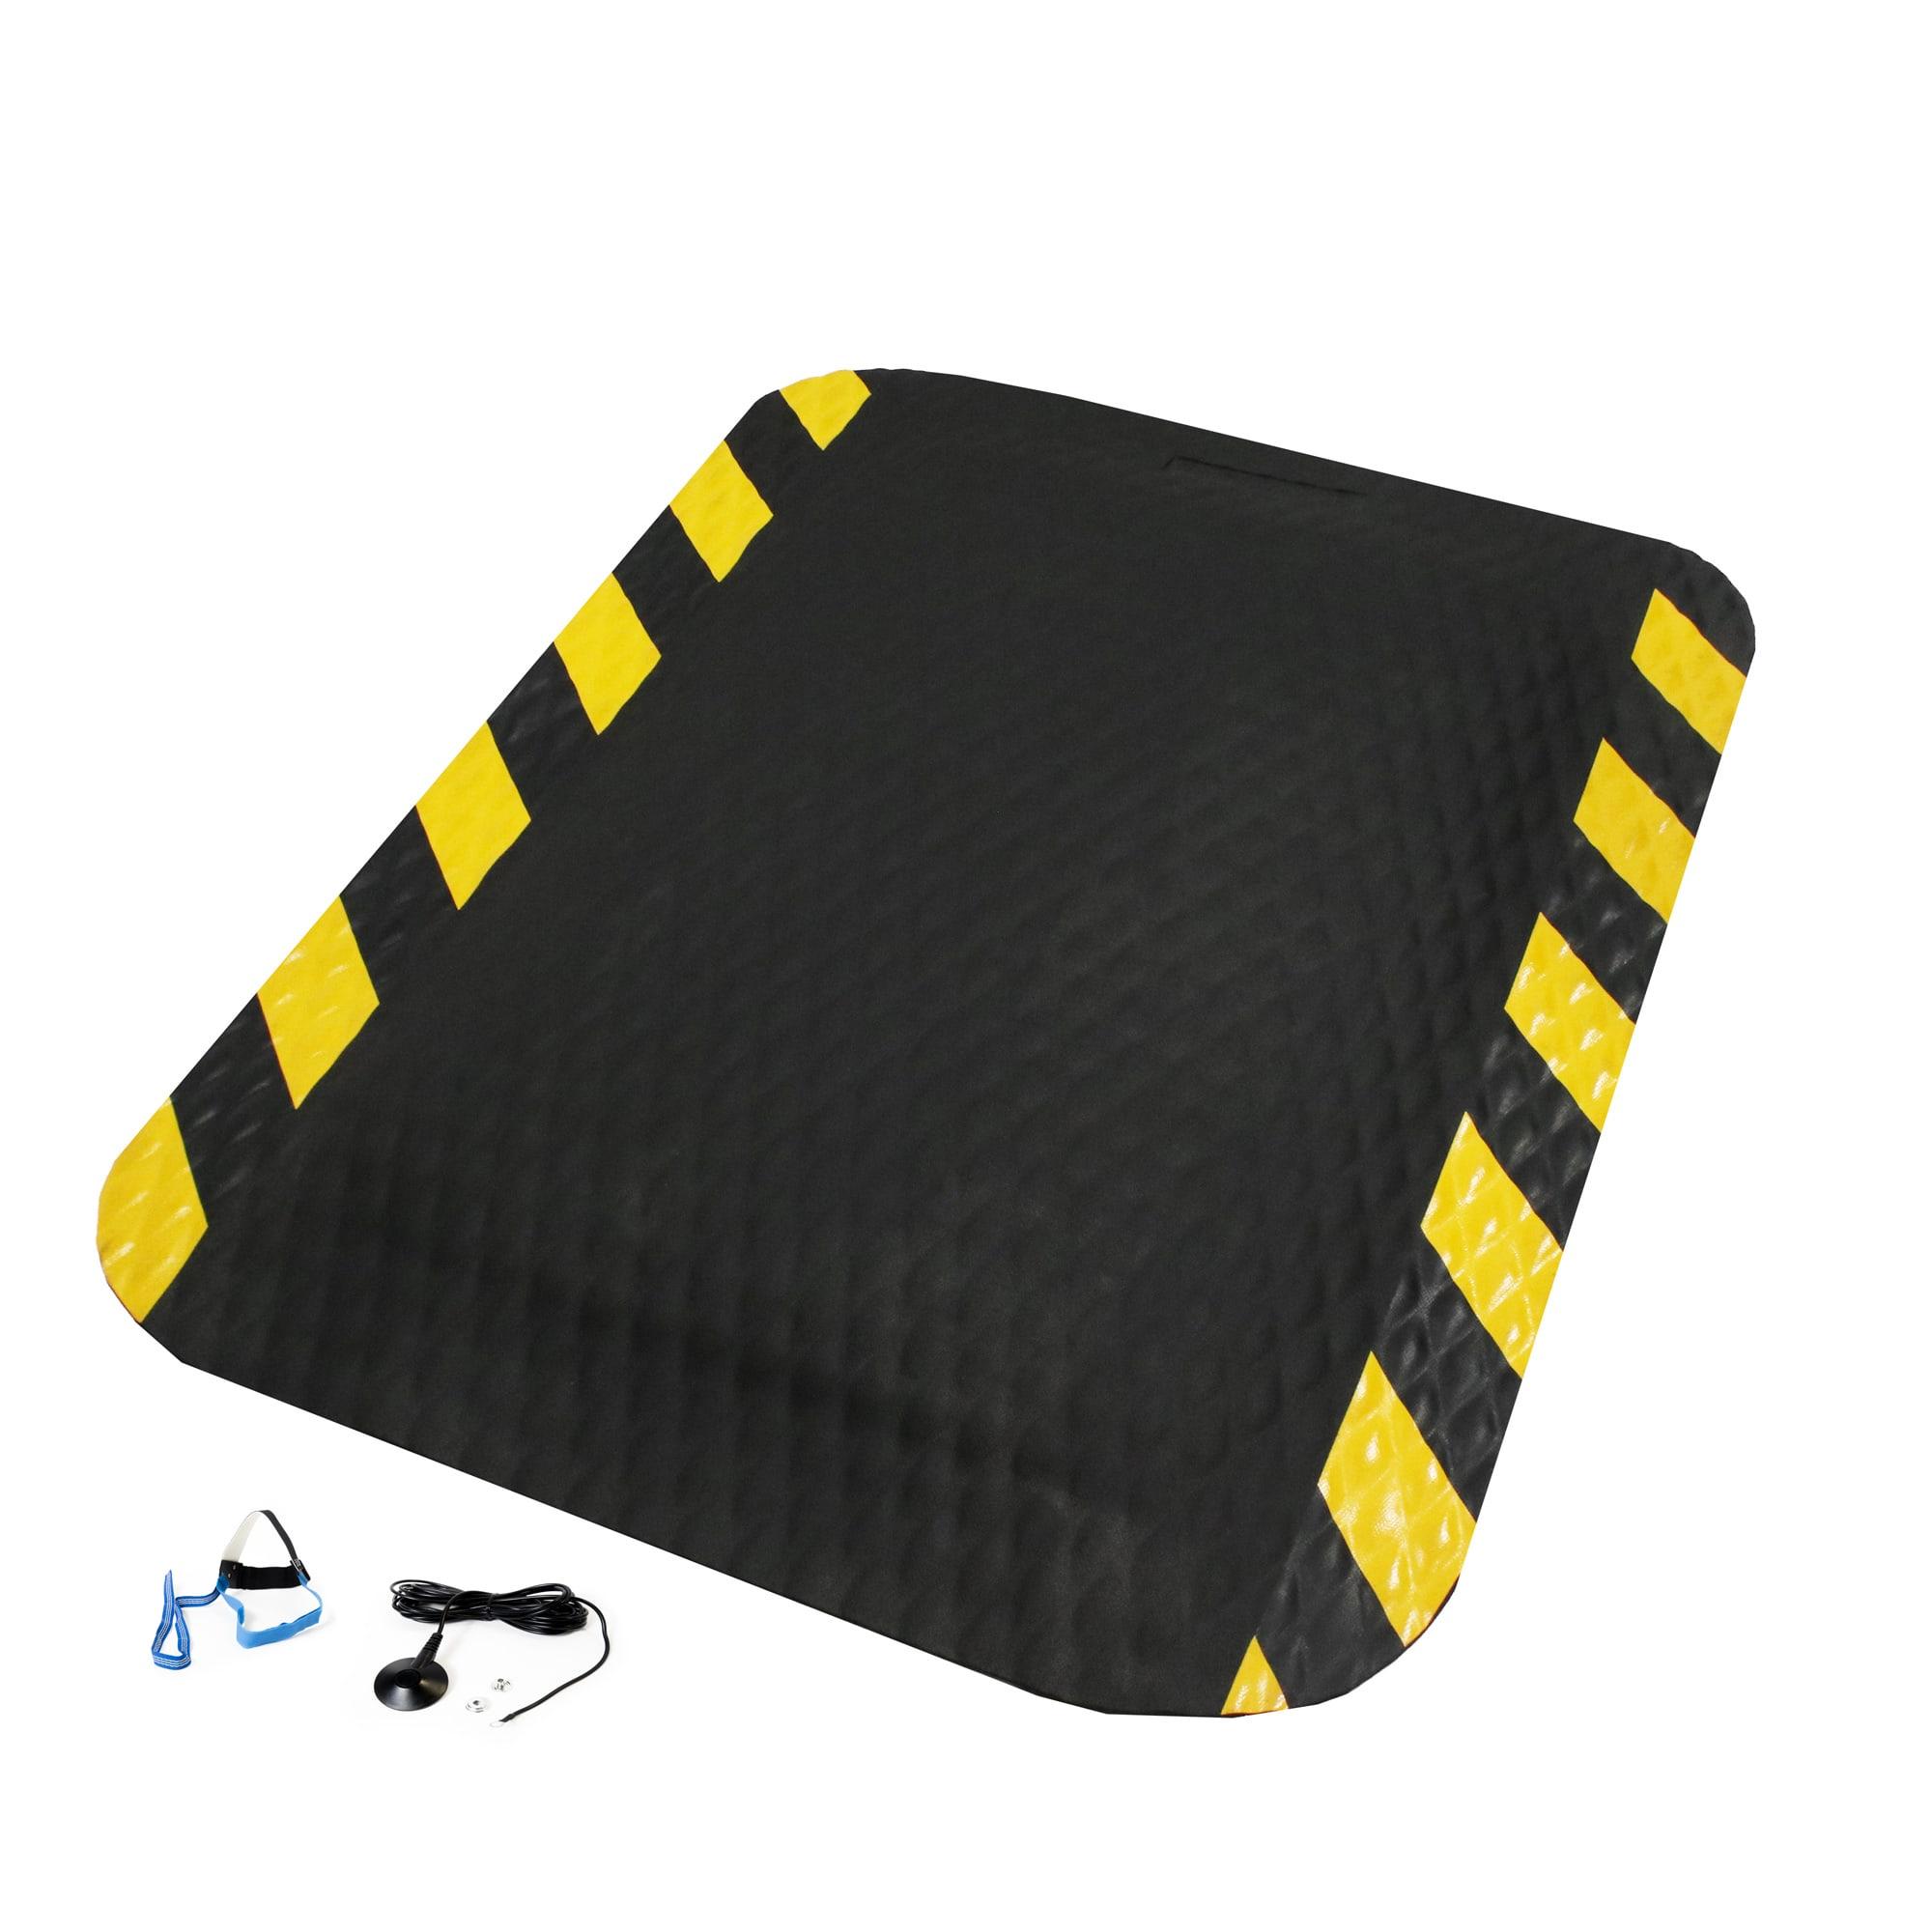 Conductive Anti Fatigue Mat Kits